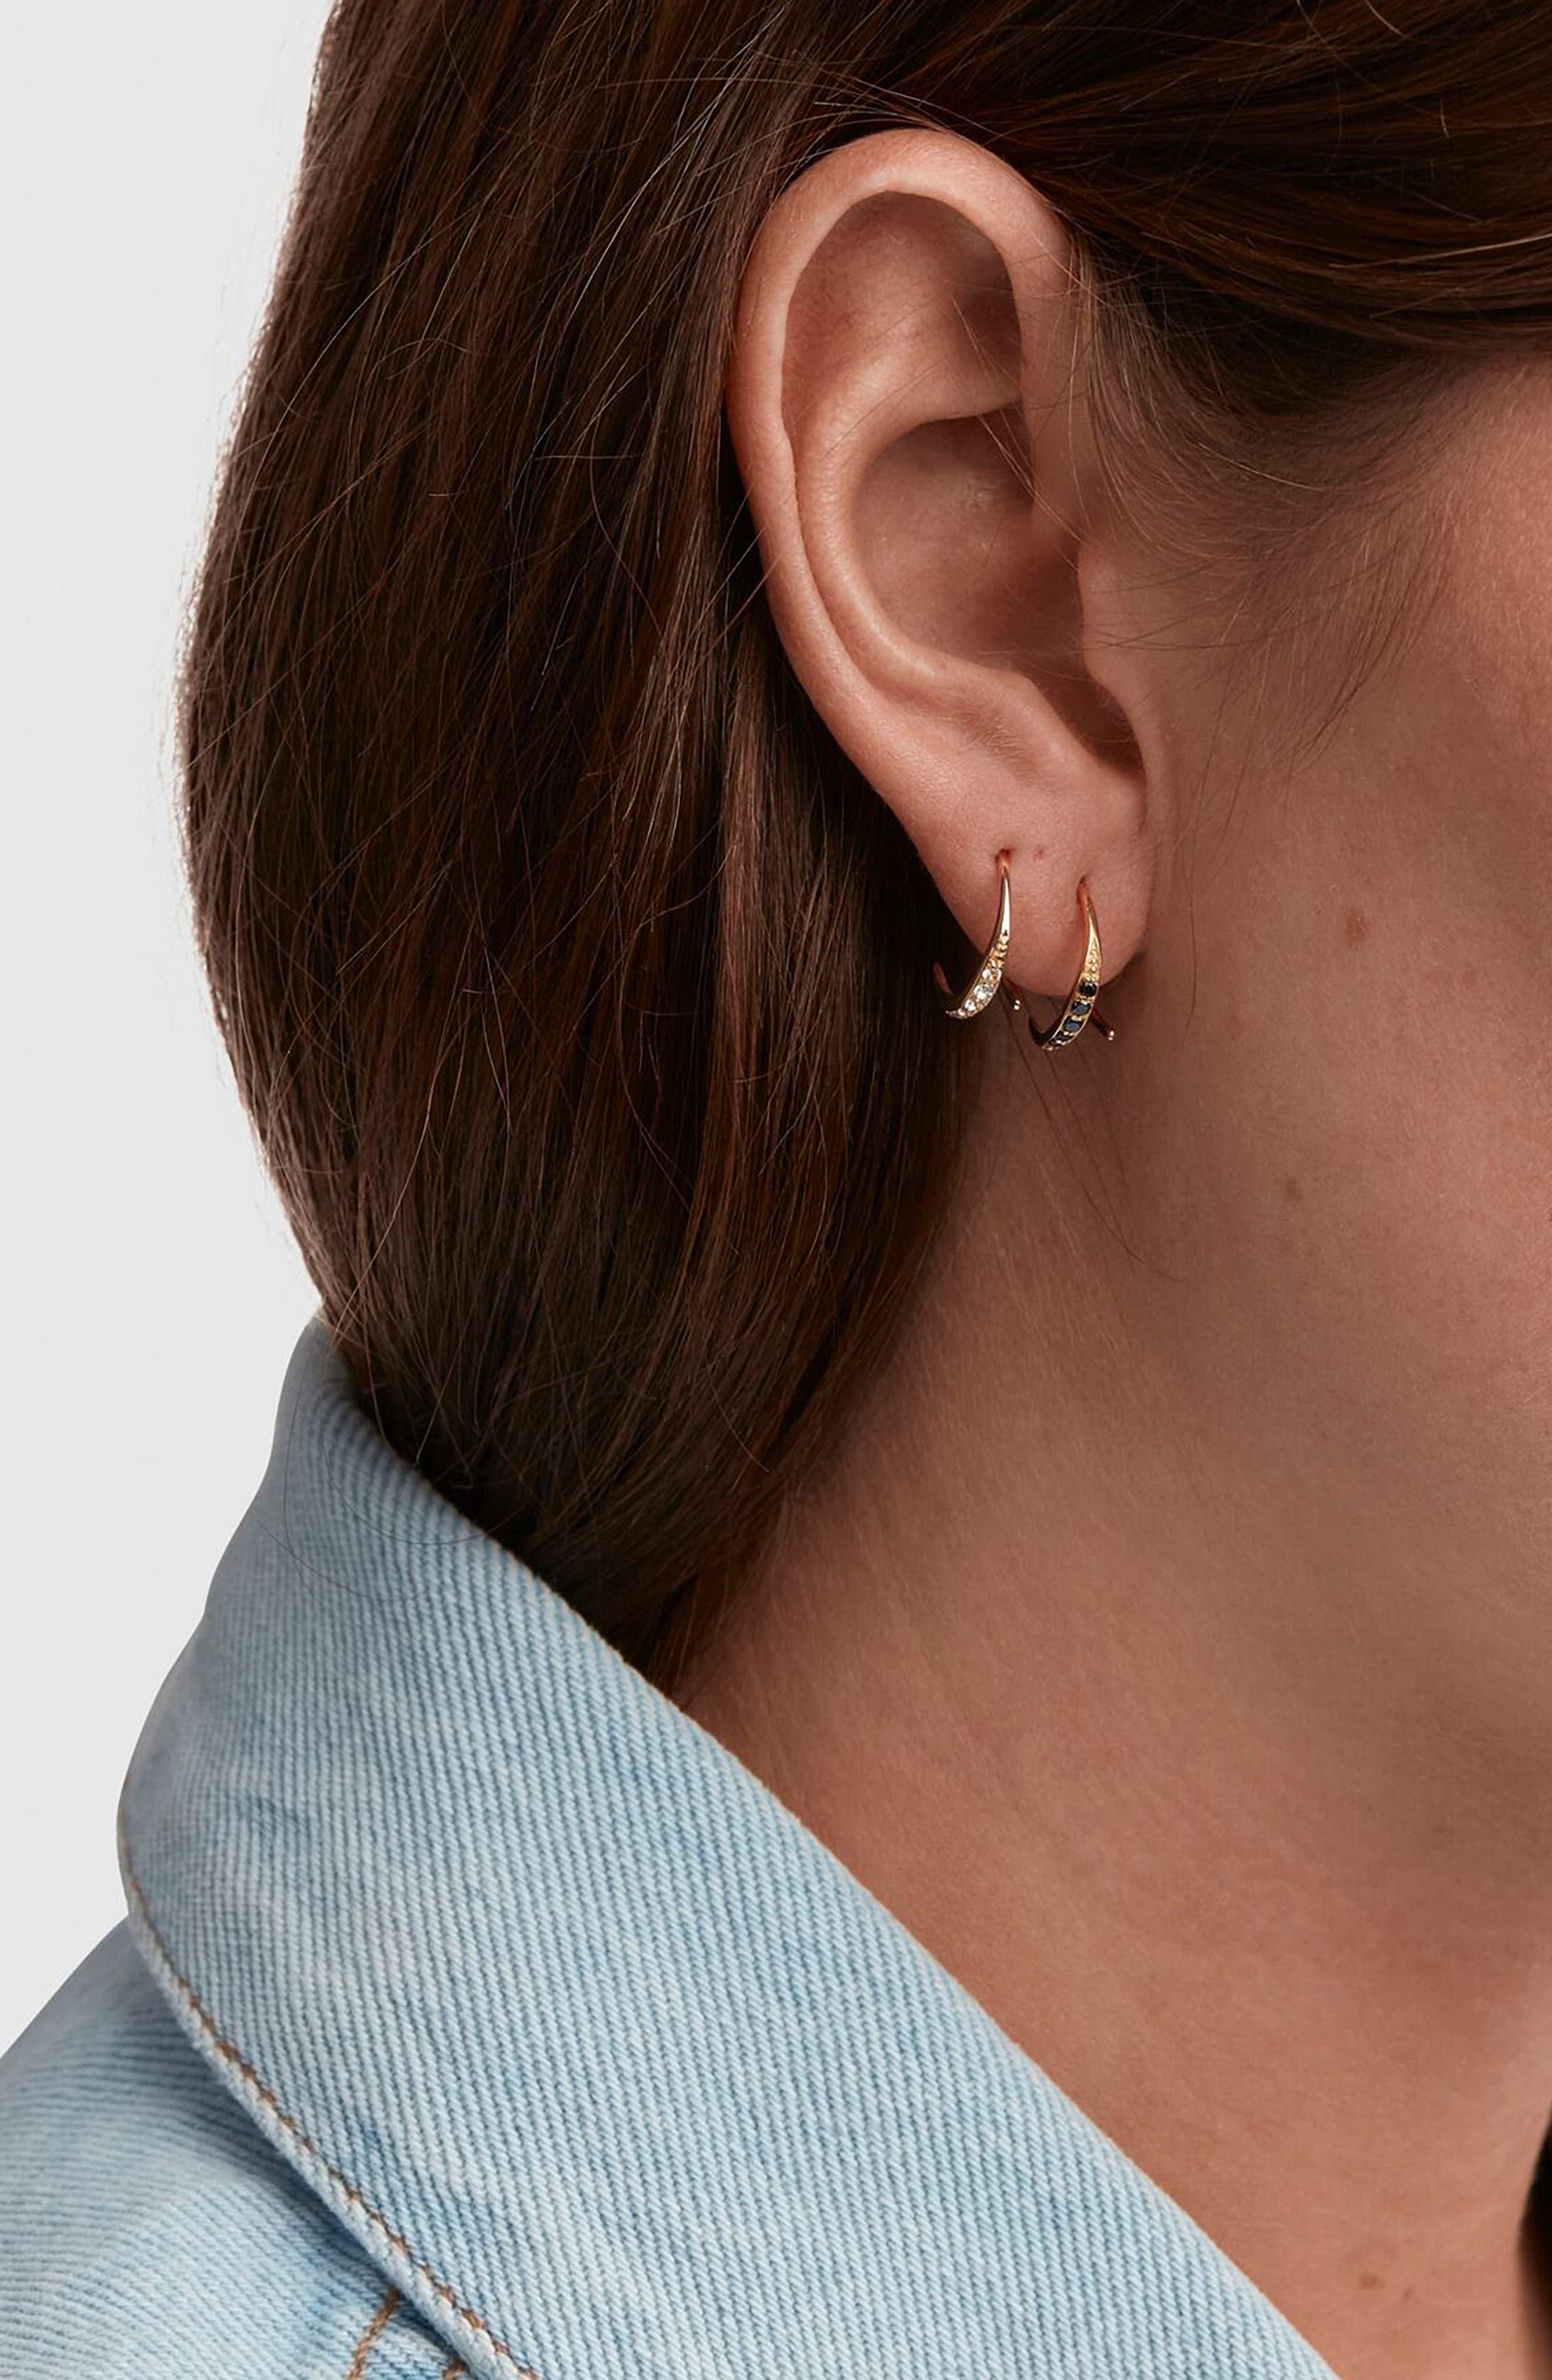 Mini Ear Loop Topaz Earrings,                             Alternate thumbnail 3, color,                             925 STERLING SILVER